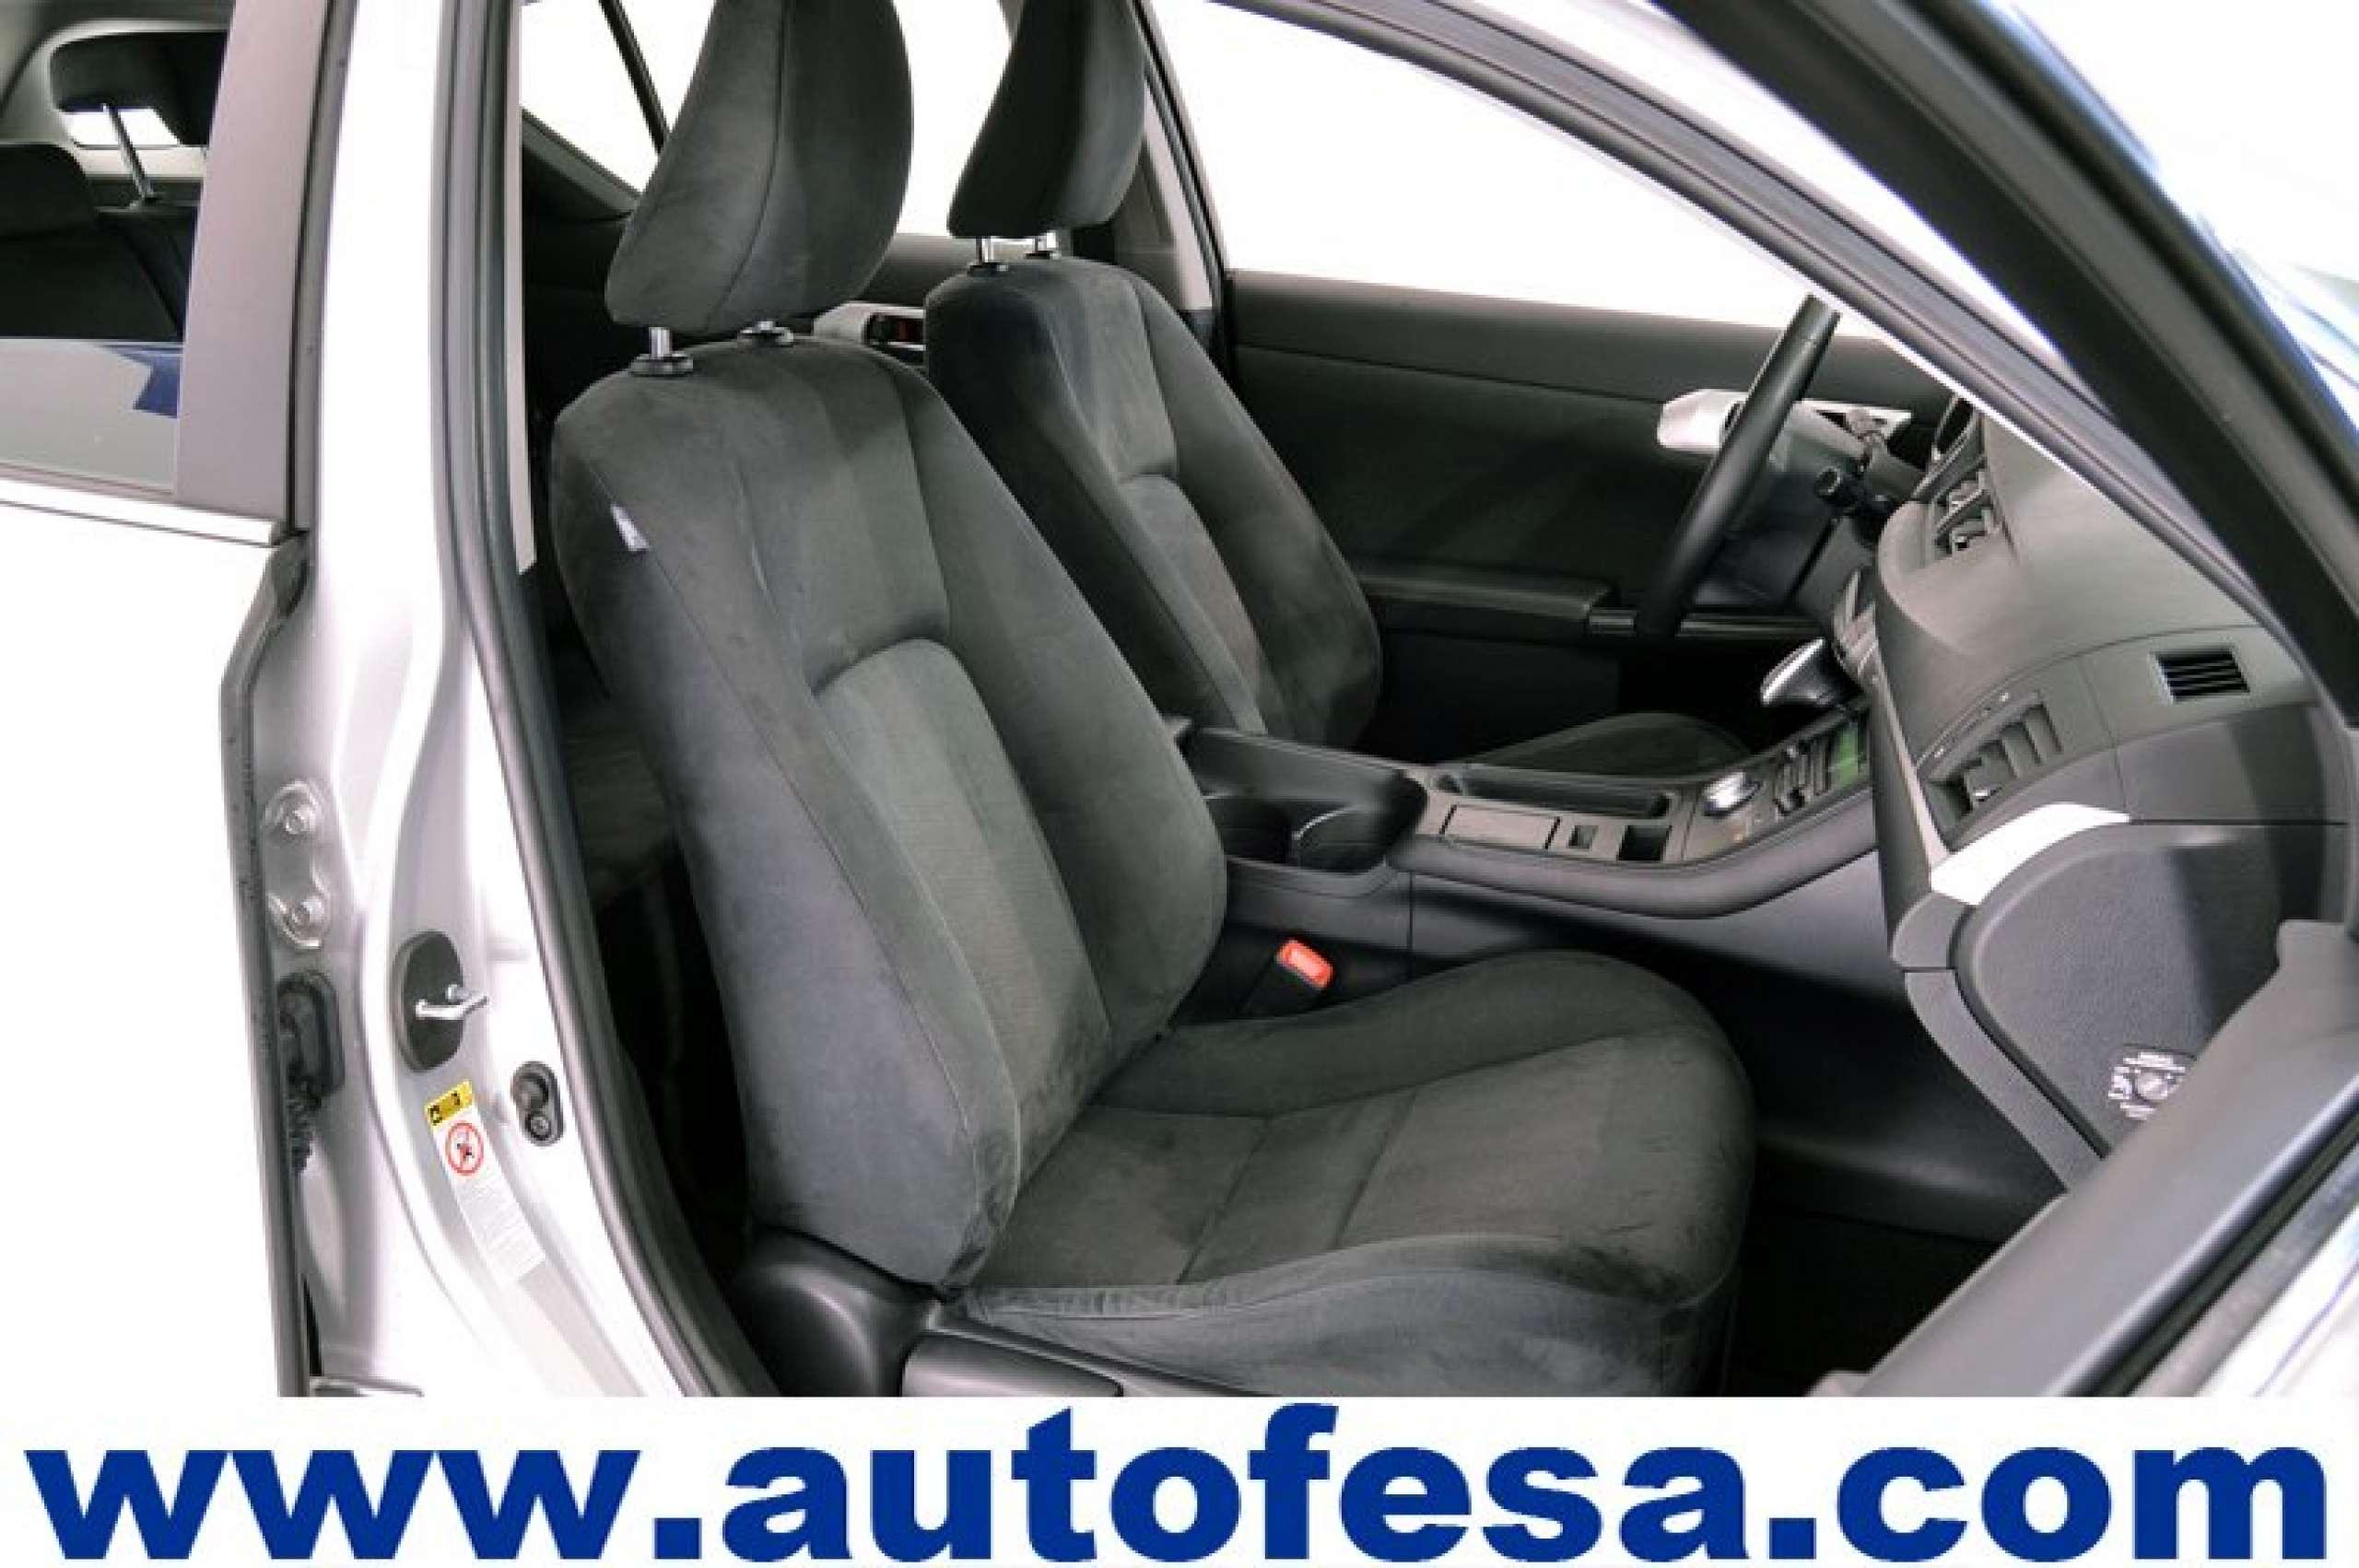 Lexus Ct 200h 1.8 136cv Eco Auto 5p - Foto 30